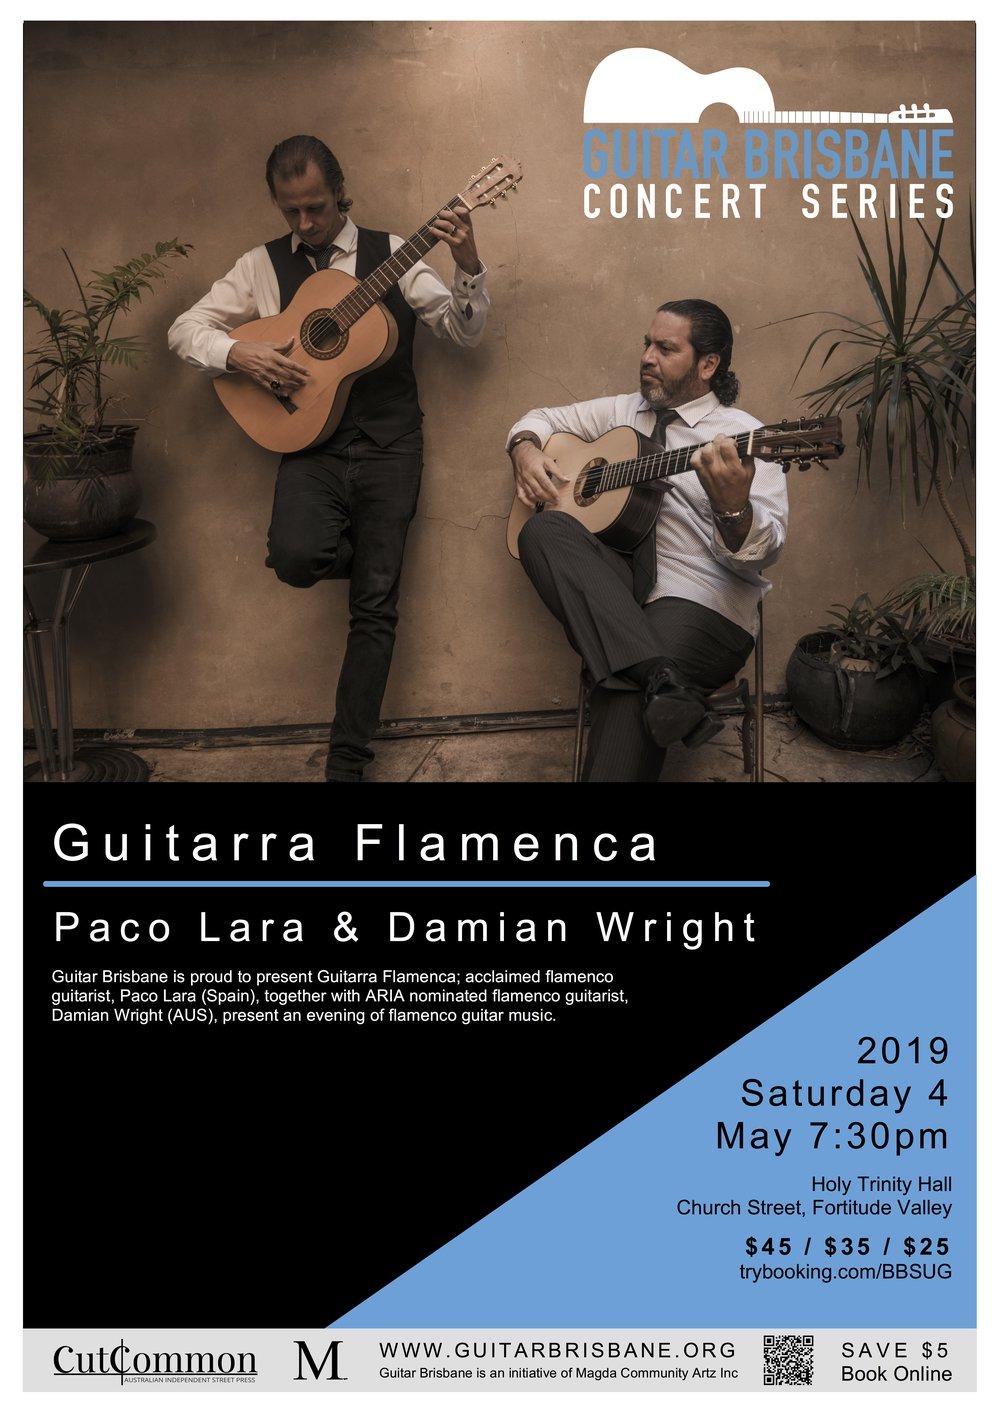 Guitarra Flamenca A3 poster.jpg